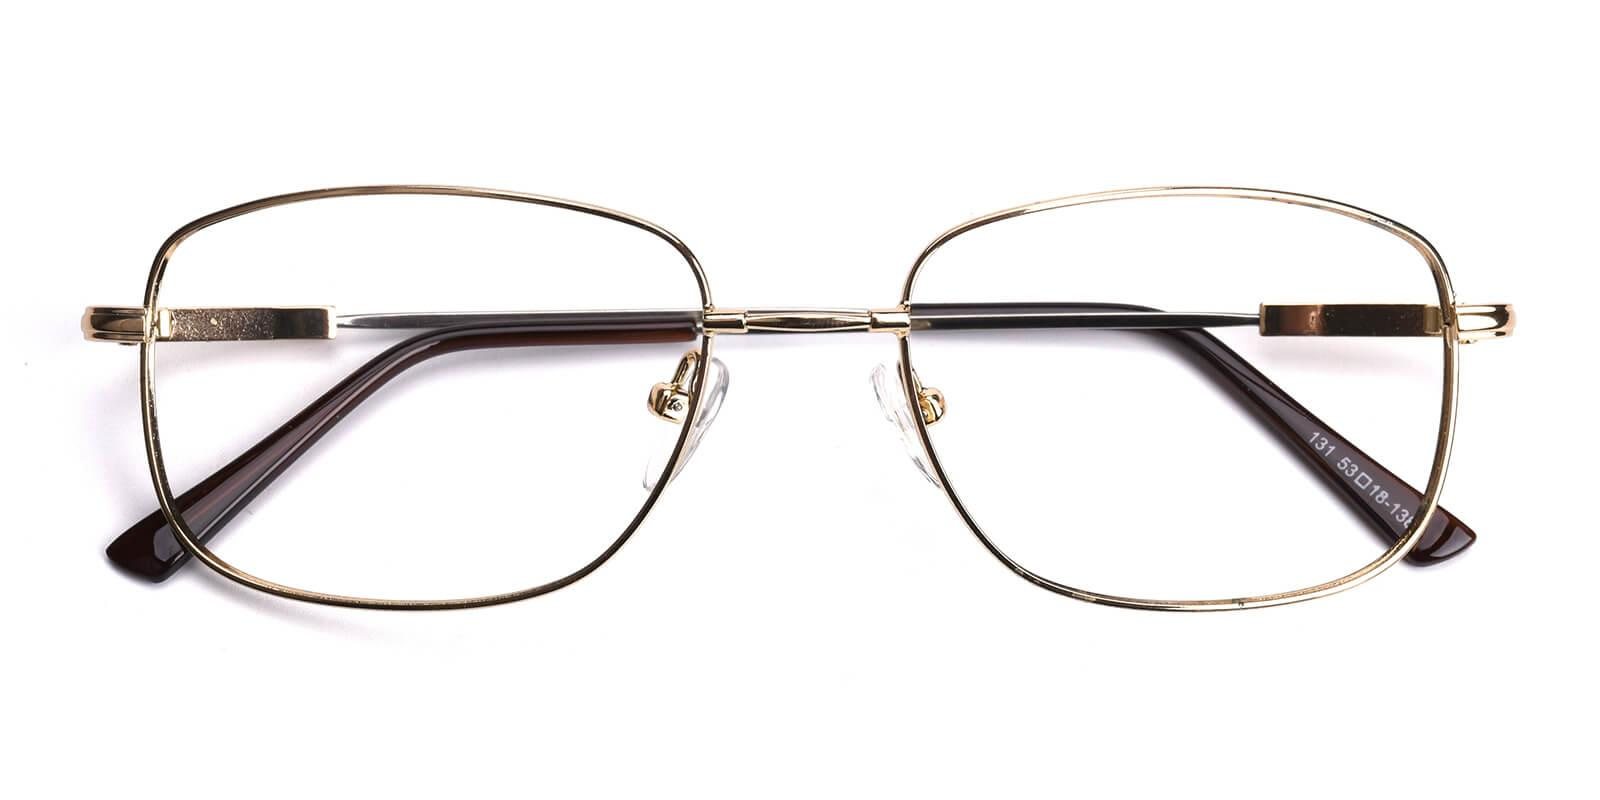 Twist-Gold-Square-Metal-Eyeglasses-detail